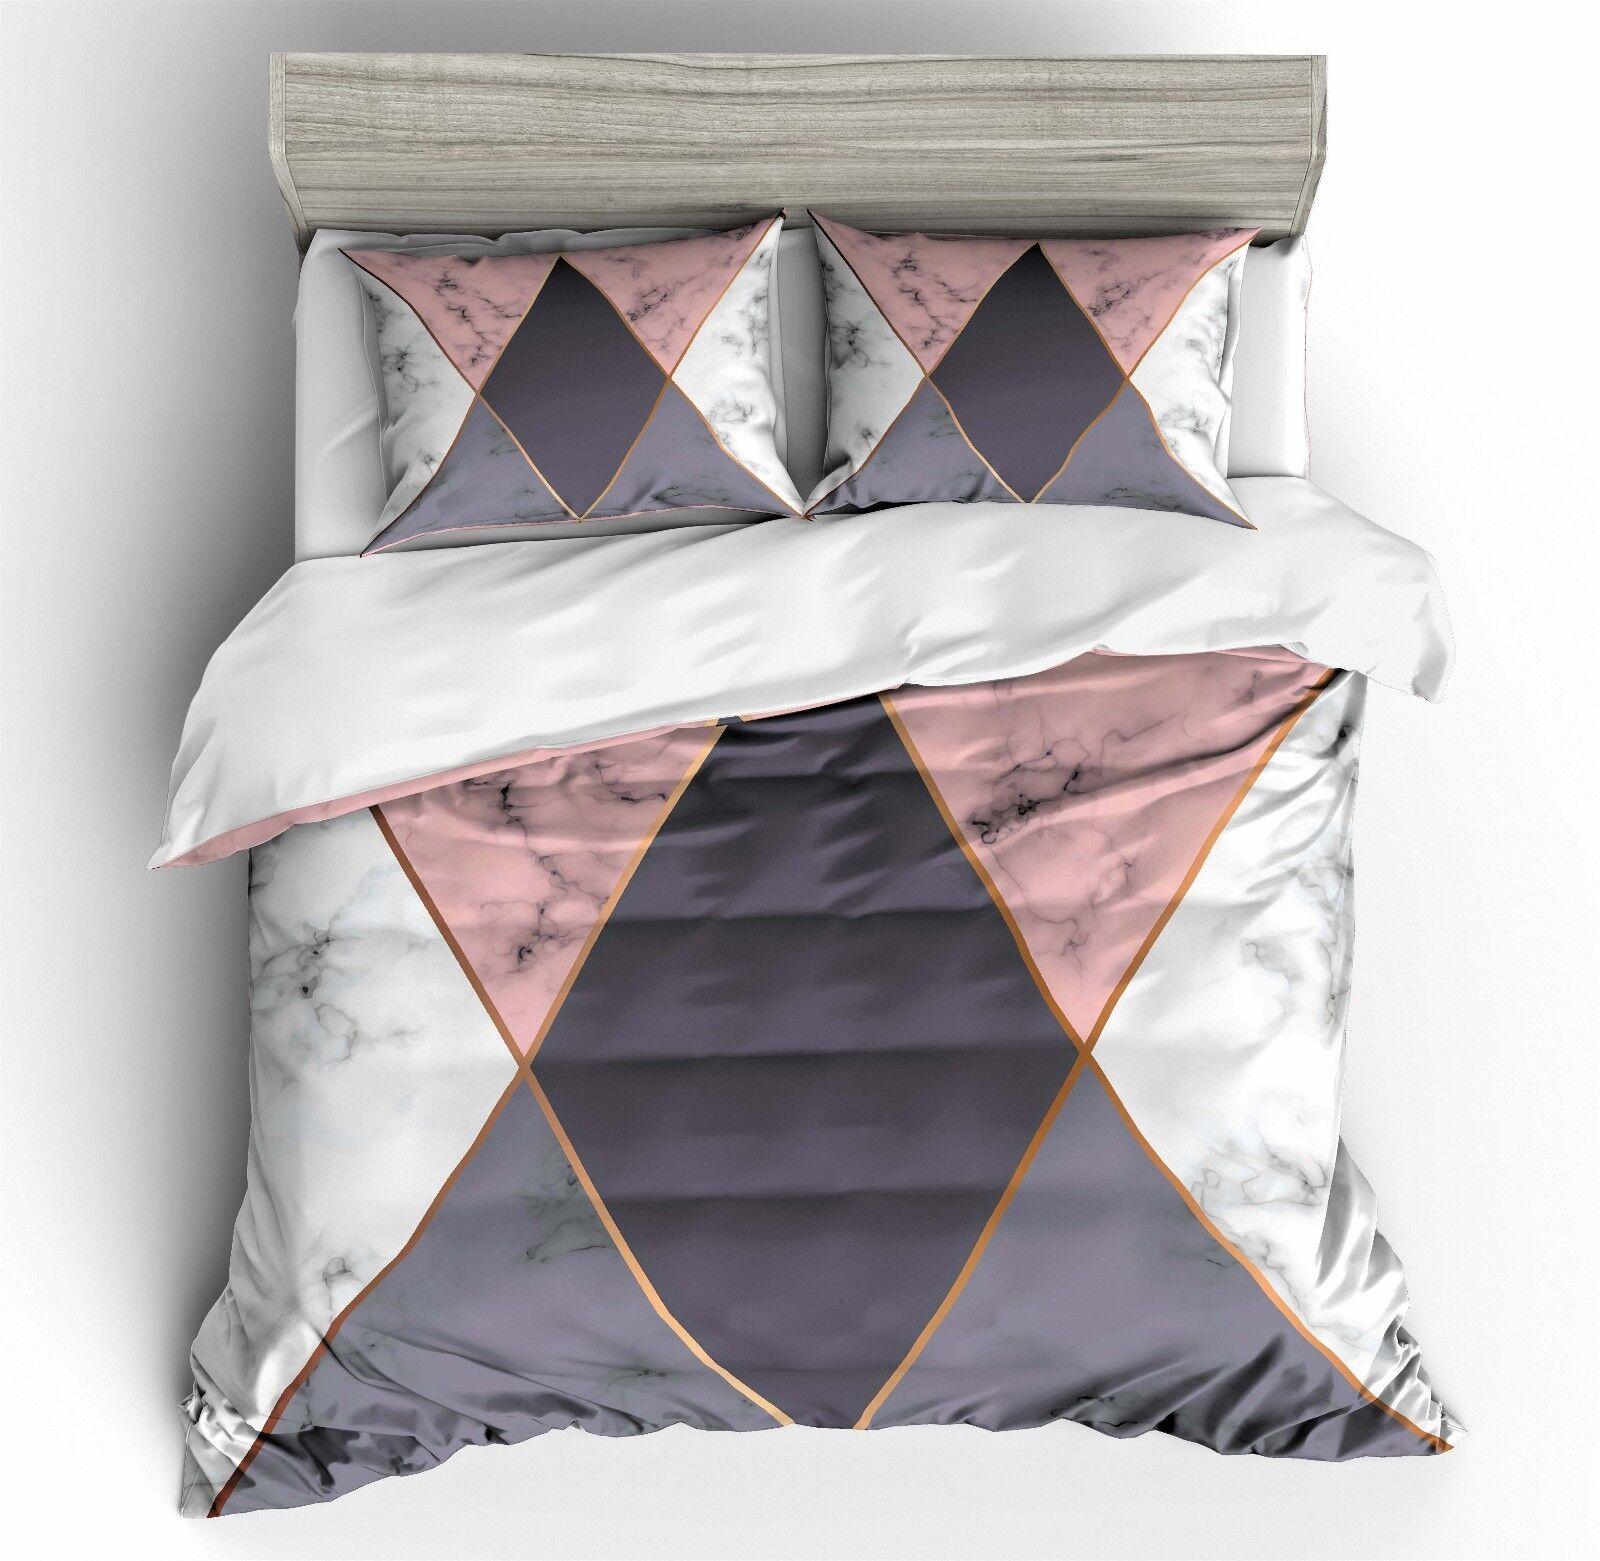 3D Marble Pattern Bedding Set Duvet Cover Comforter Cover Pillow Case F2 Ske15